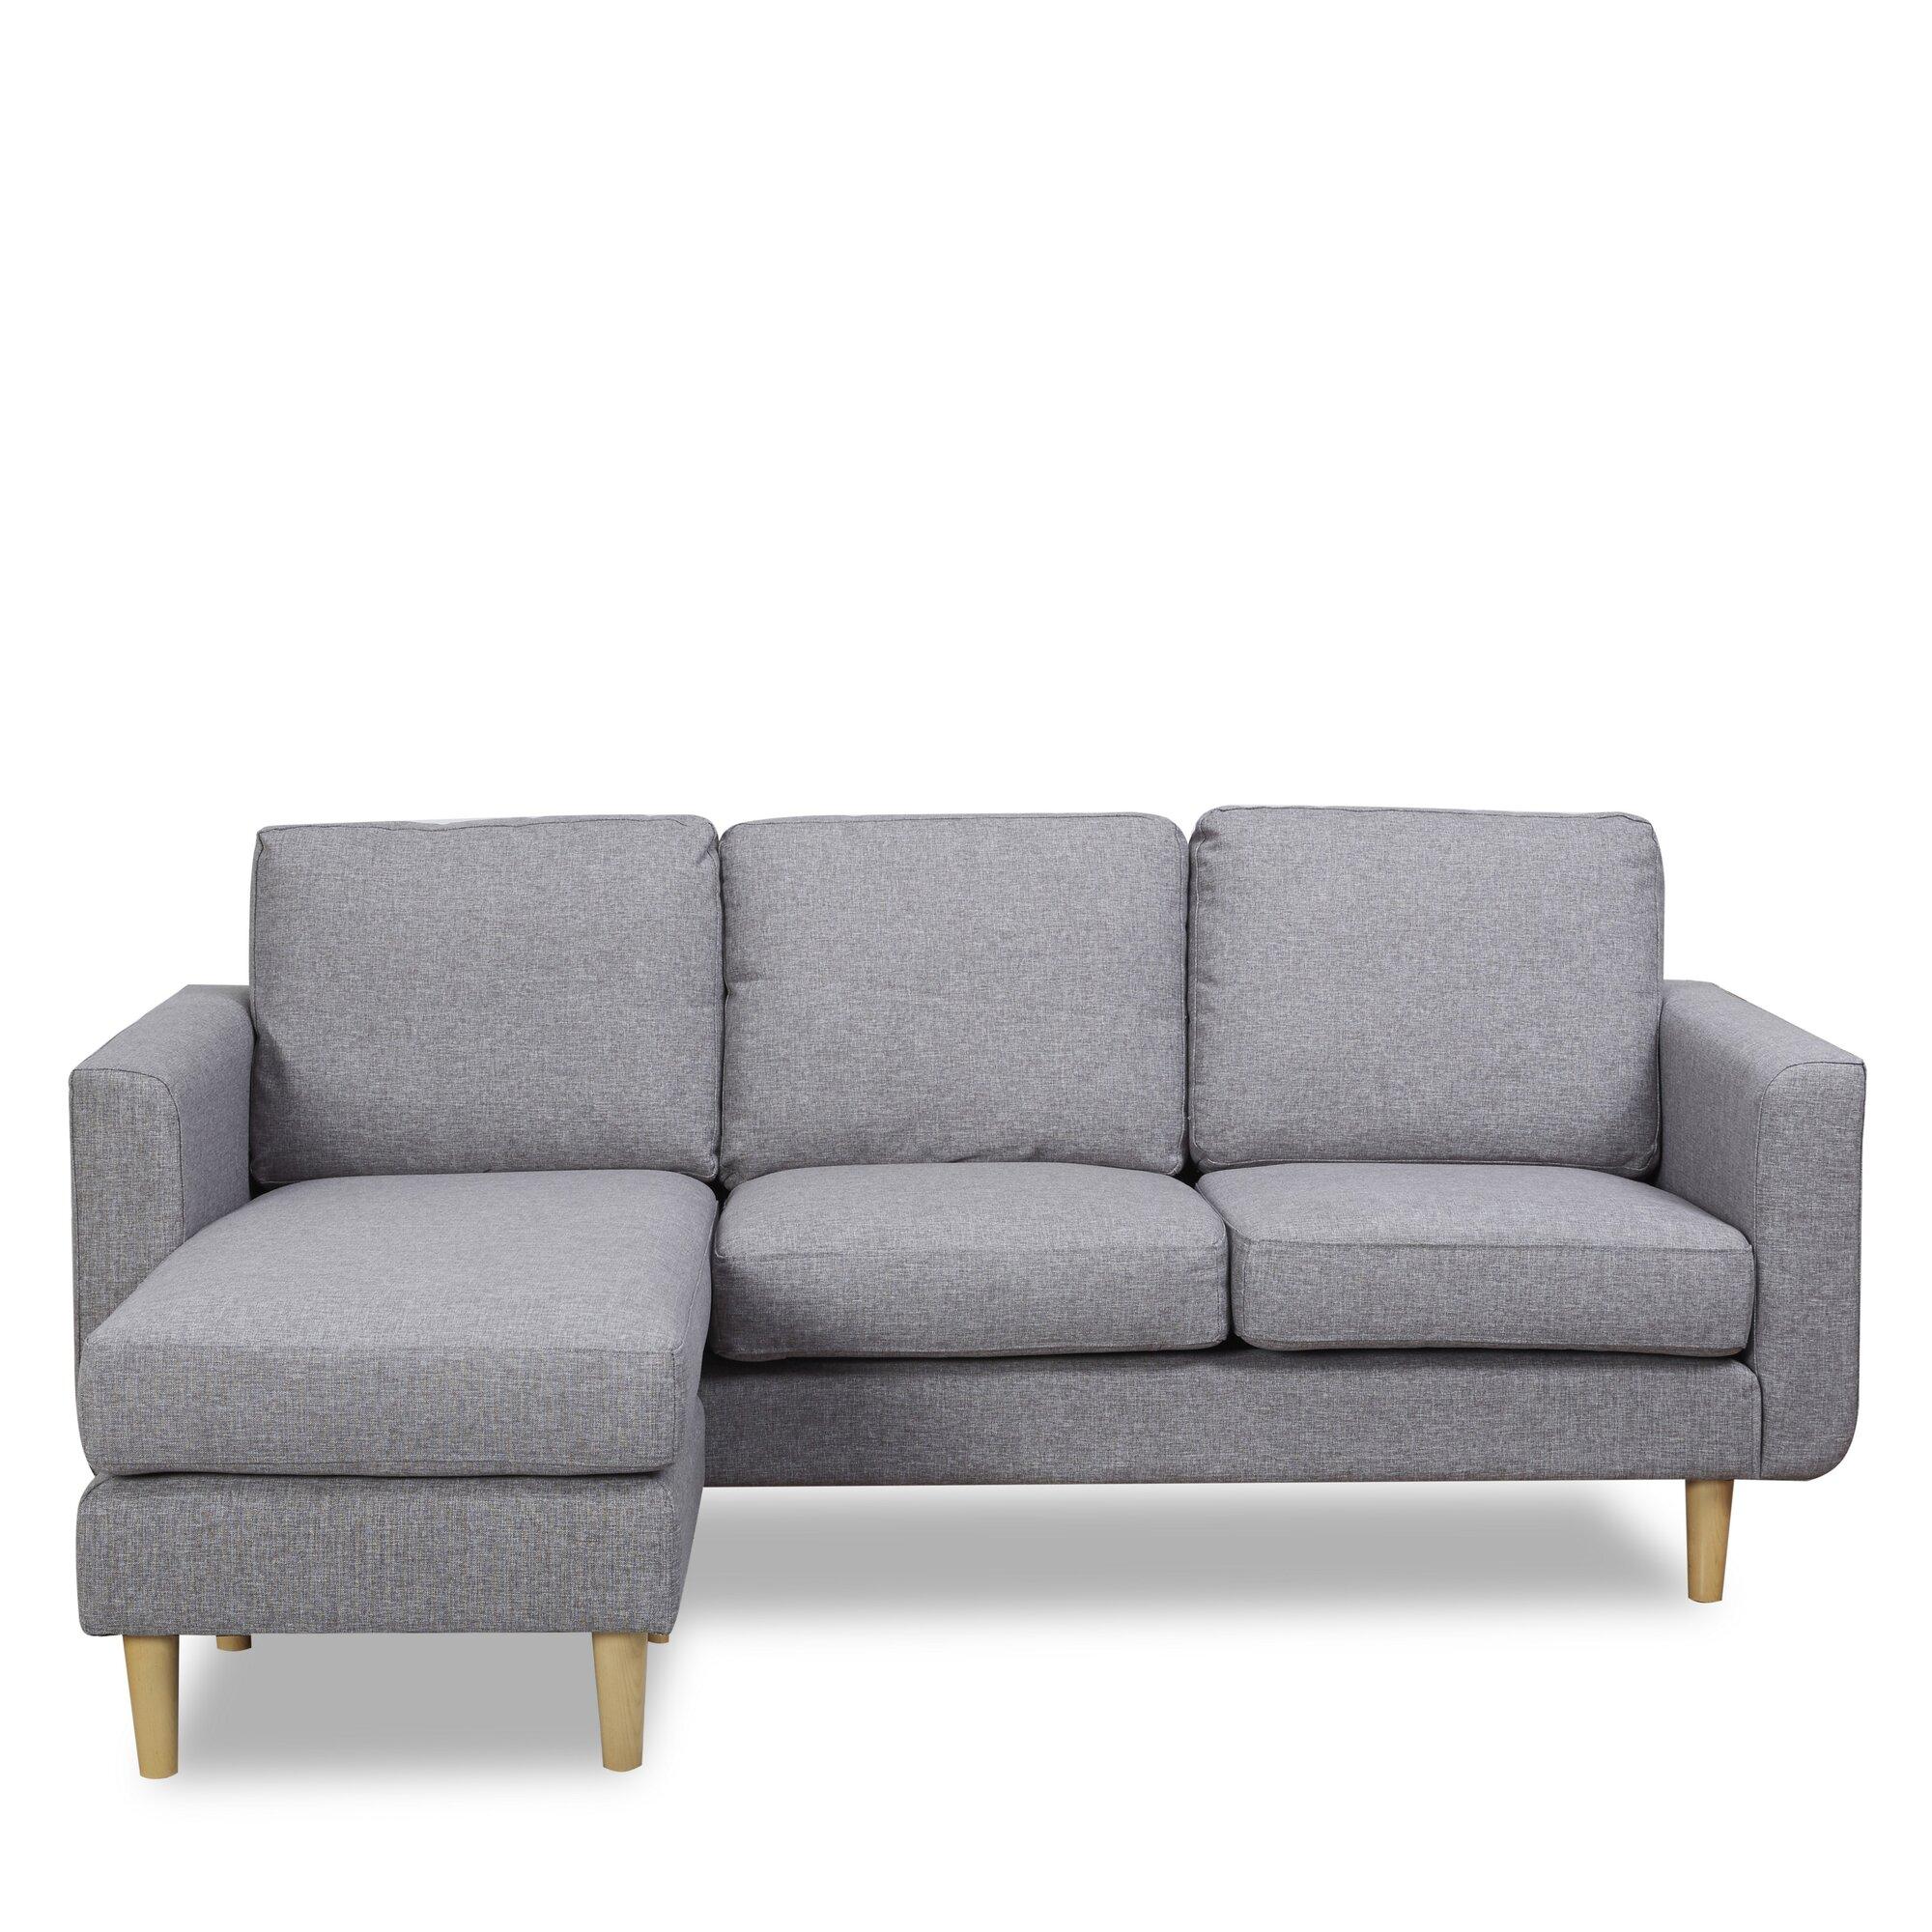 modern you ecksofa lorenzo mit bettfunktion bewertungen. Black Bedroom Furniture Sets. Home Design Ideas